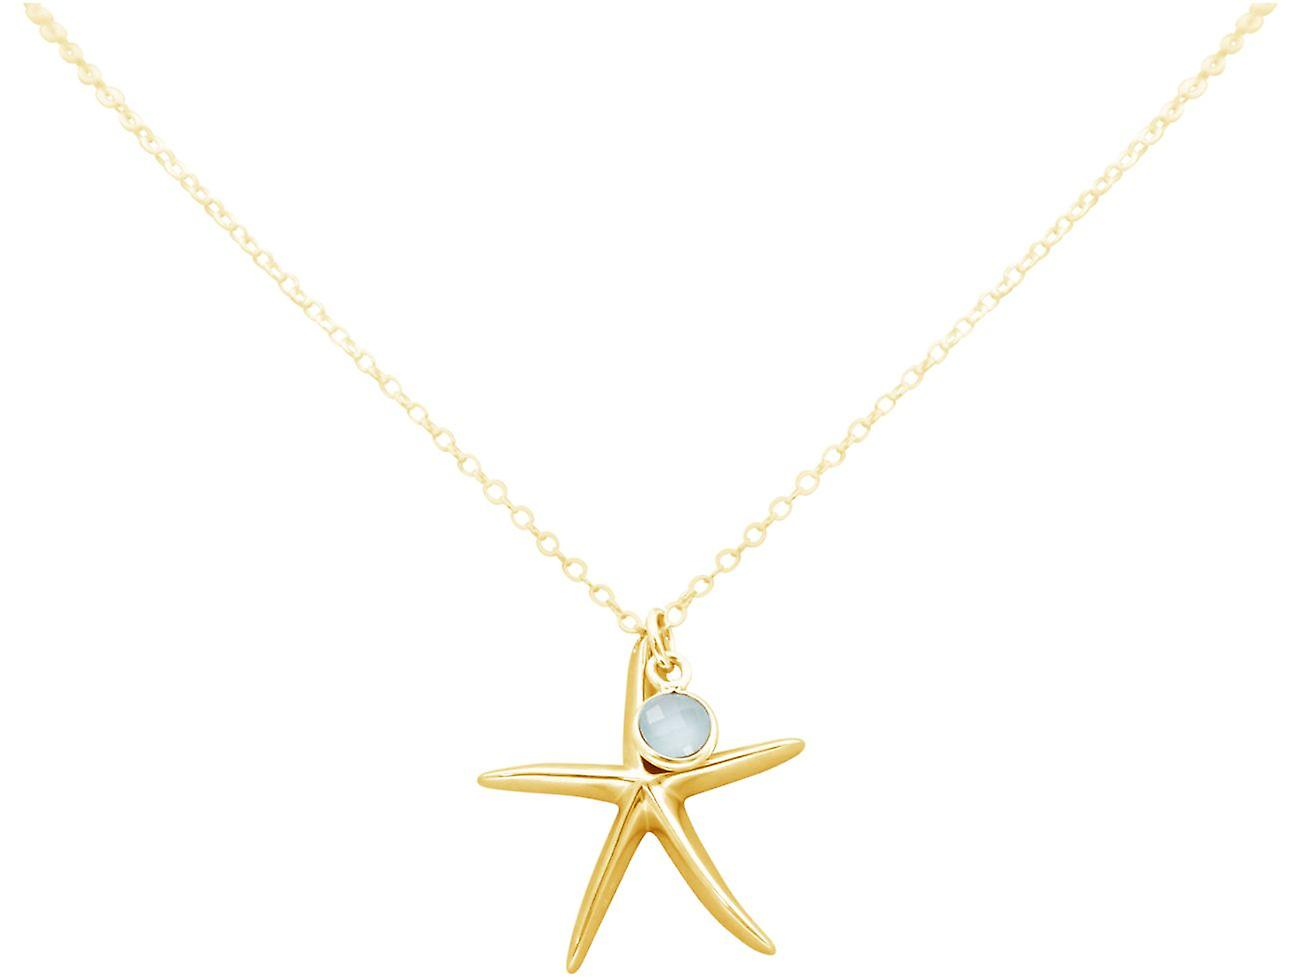 GEMSHINE Maritim Halskette Seestern 925 Silber, vergoldet oder rose, Chalcedon